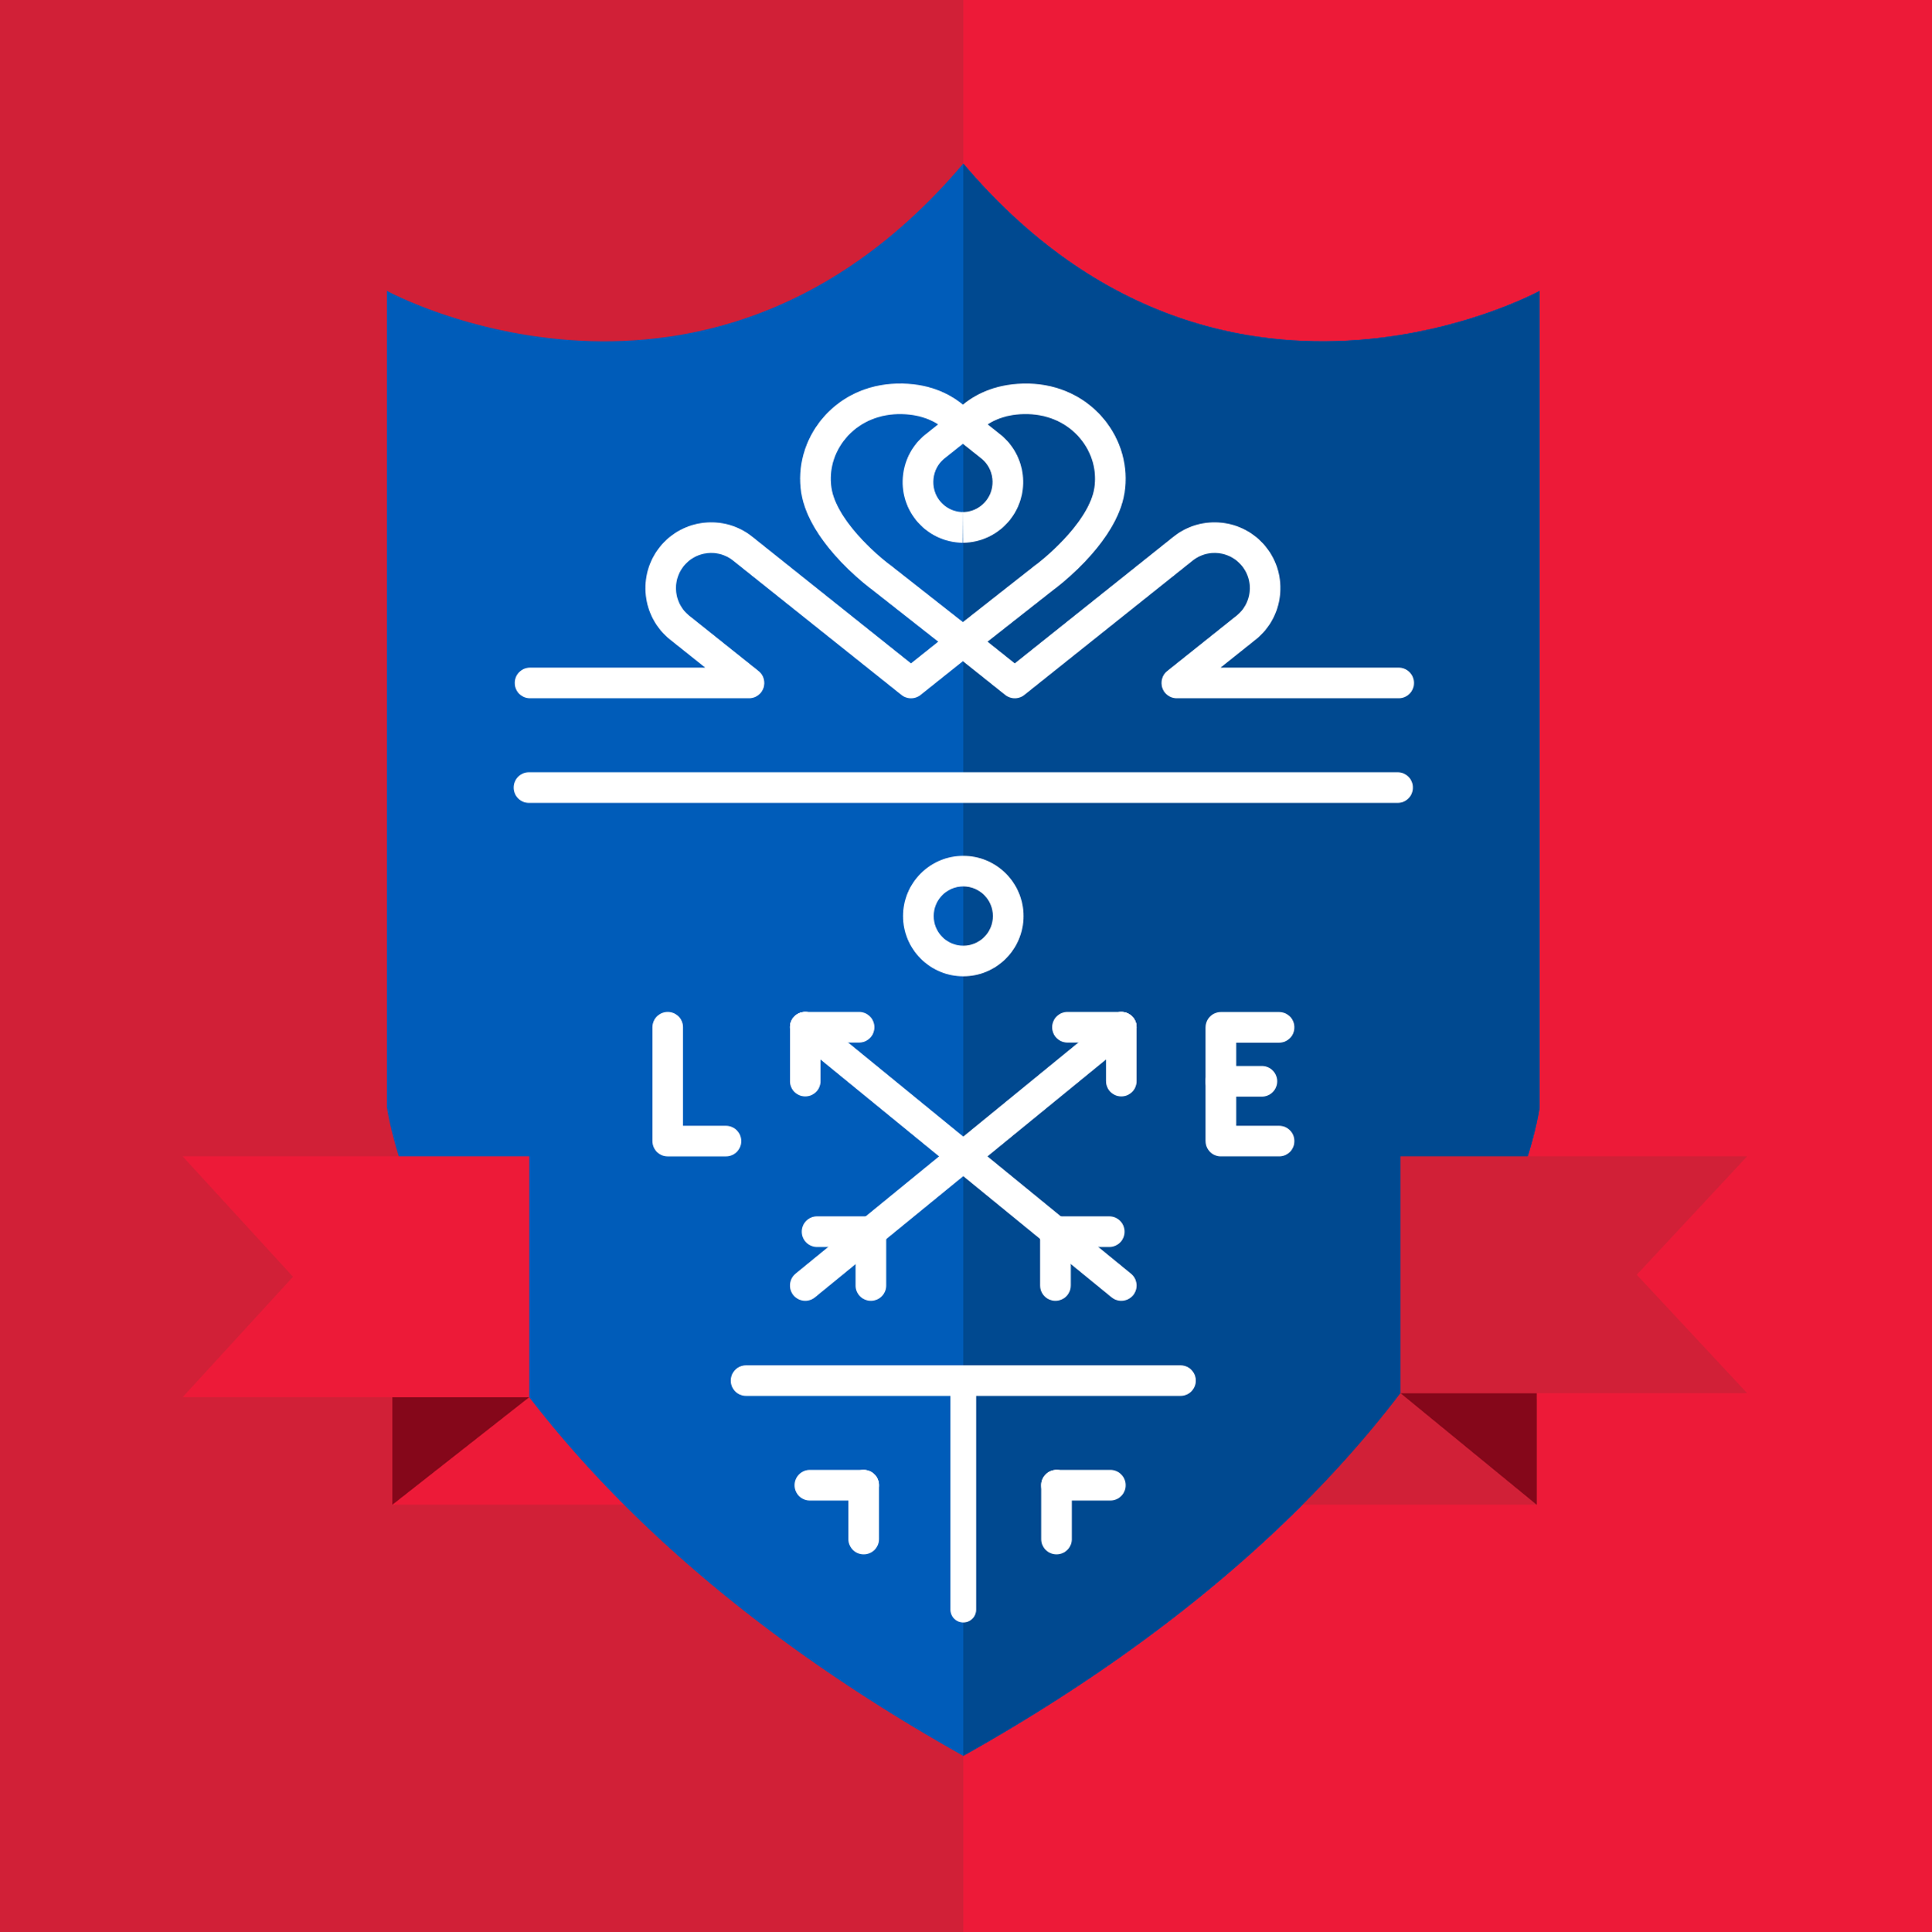 Icon: Crest